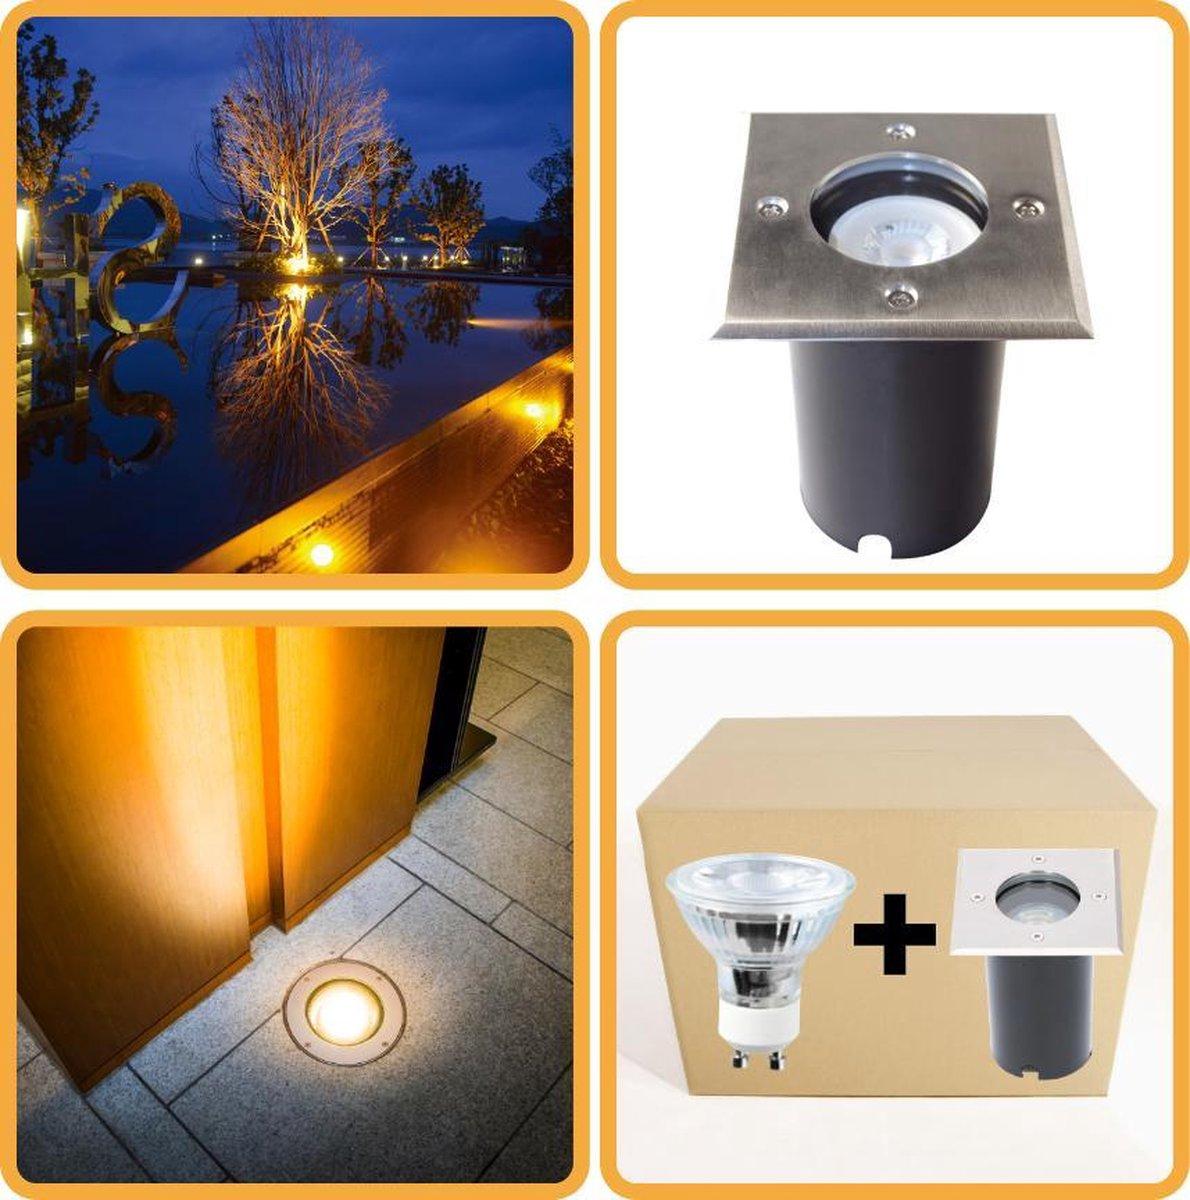 Proventa HeavyDuty LED Grondspot IP67 - Vierkant - inbouw tuinspot buiten - warm wit